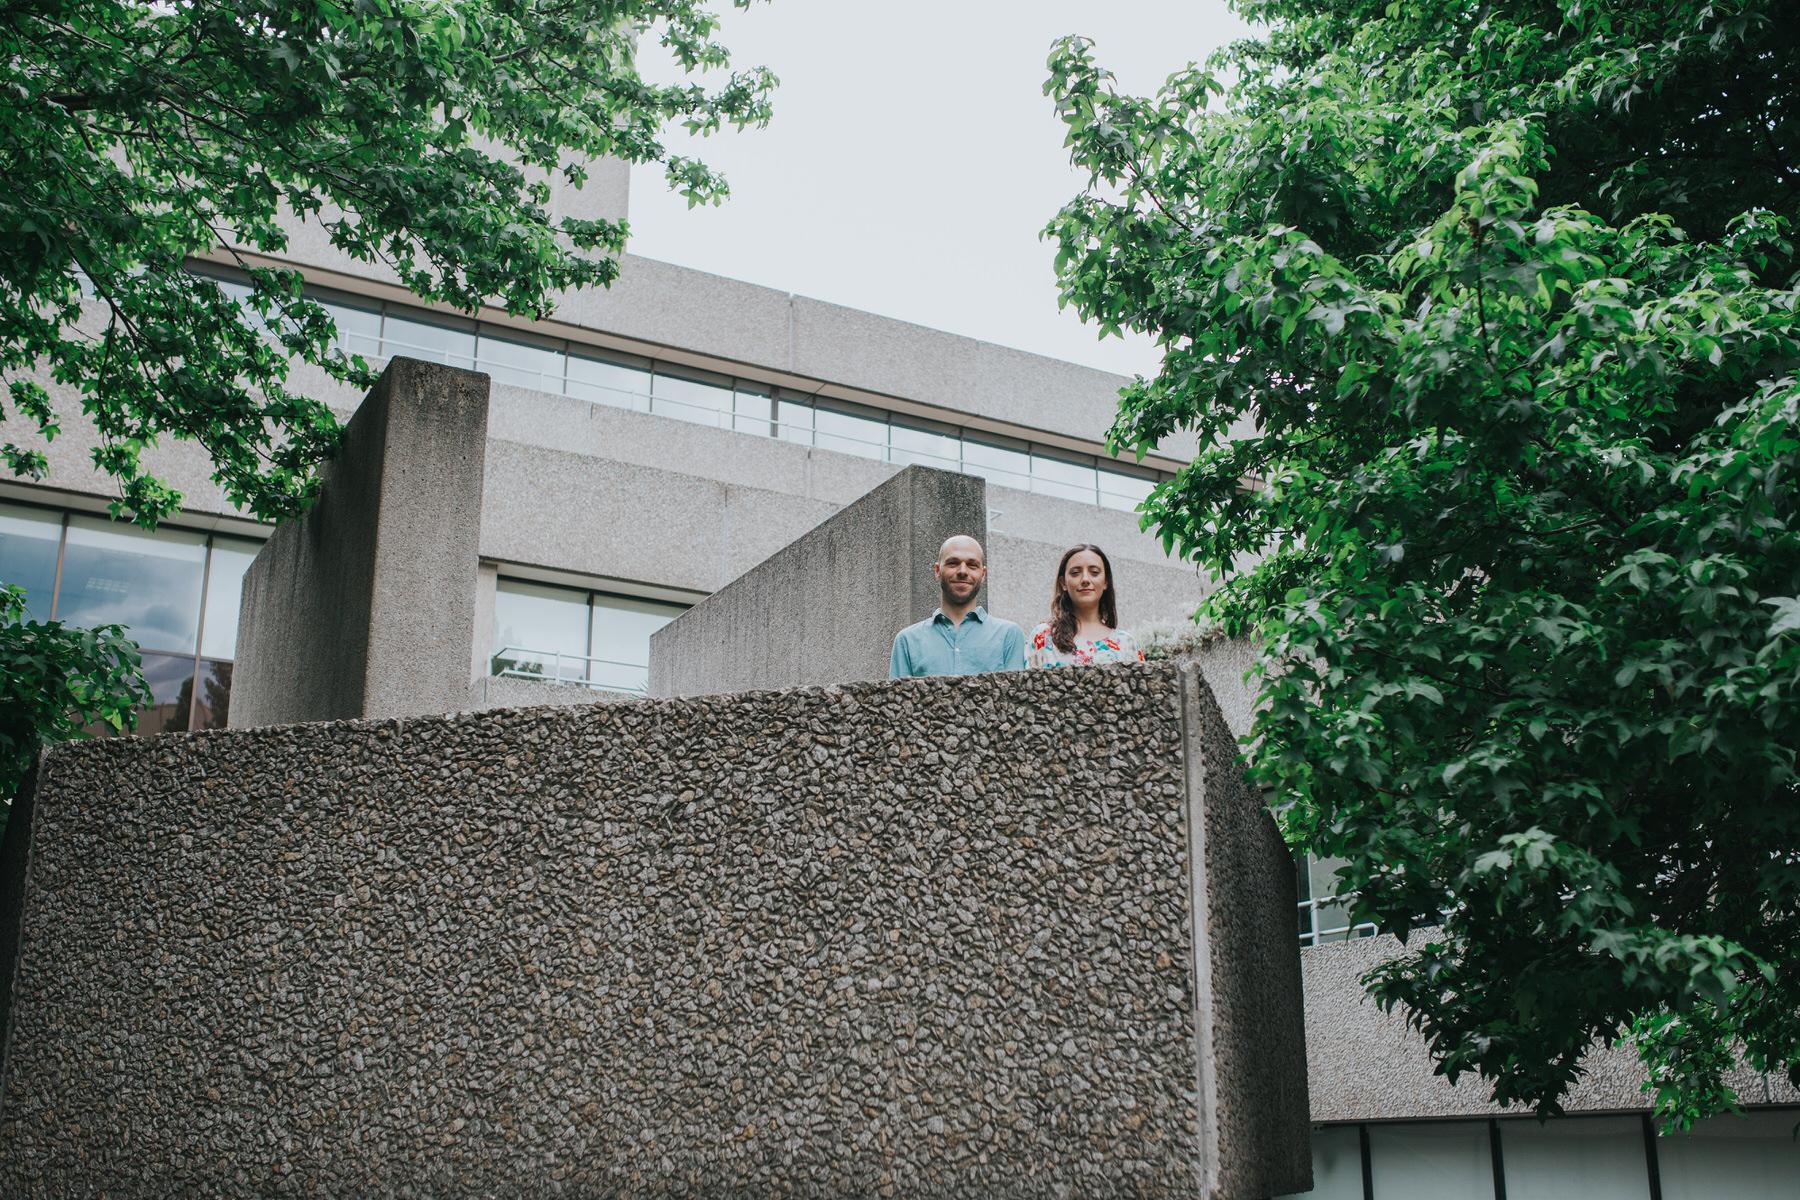 46-couple portrait shoot brutalist architecture green trees Southbank.jpg